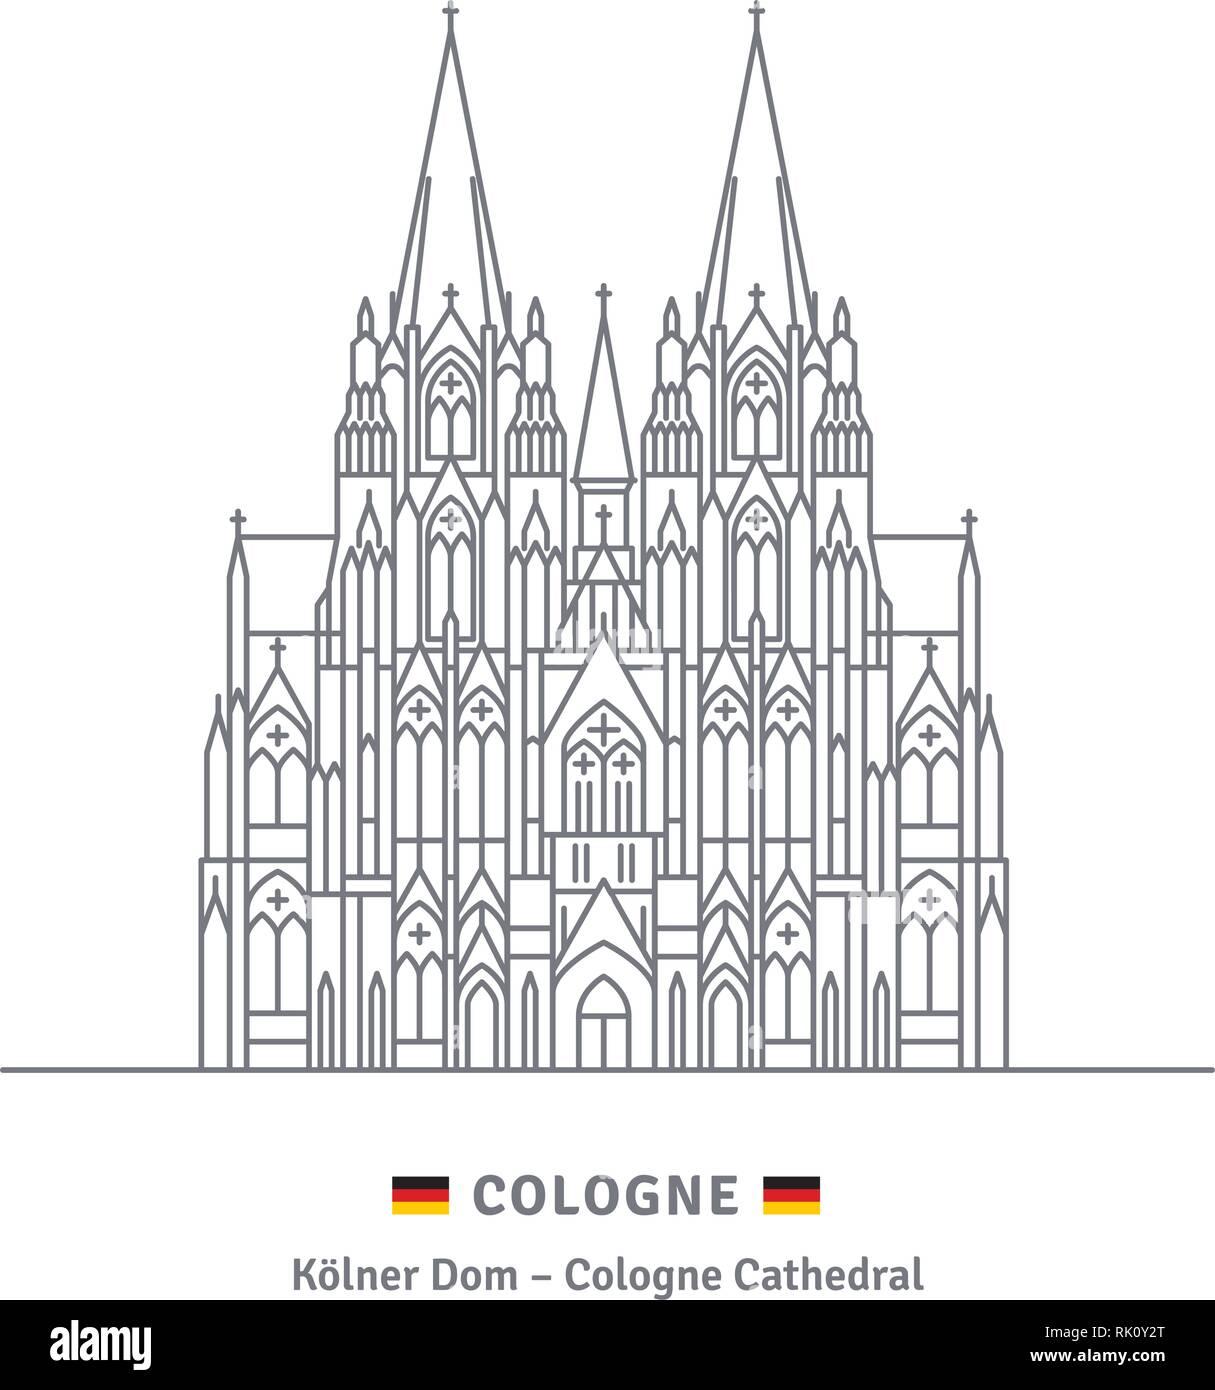 Symbol Leitung Stil Vector Illustration Des Kolner Doms Auf Weissem Hintergrund Stock Vektorgrafik Alamy